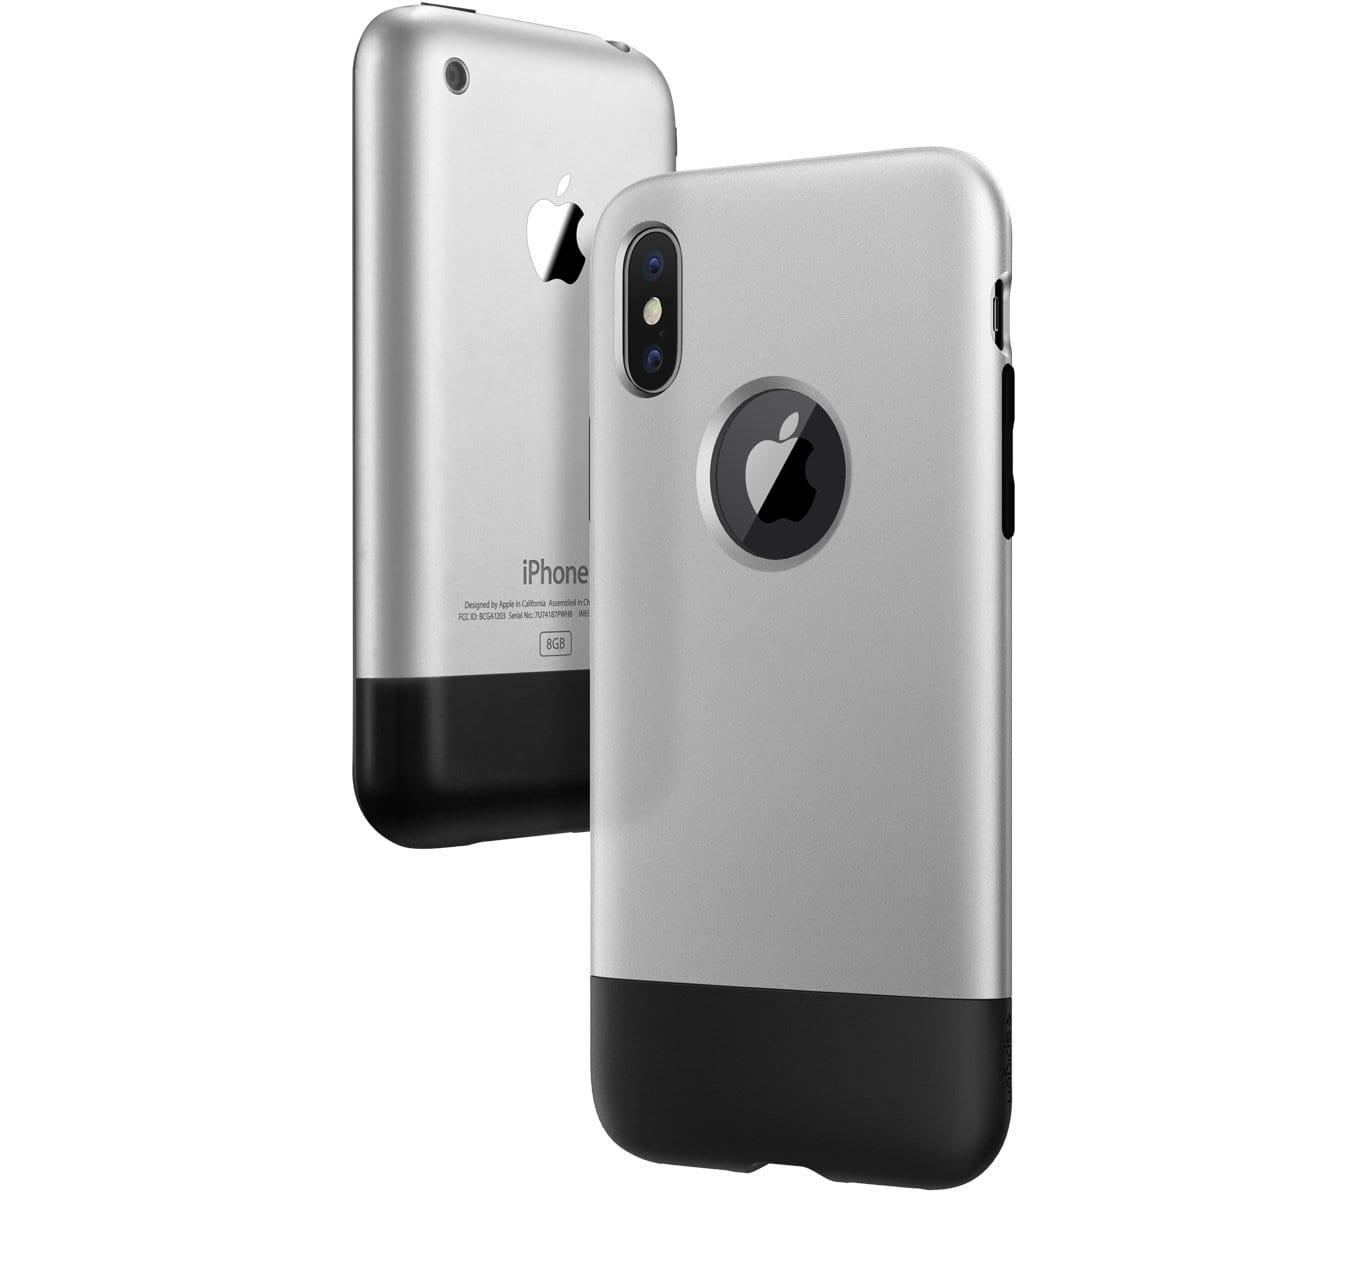 spigen iphone x classic one overview - Spigen predstavil sériu retro obalov pre iPhone X